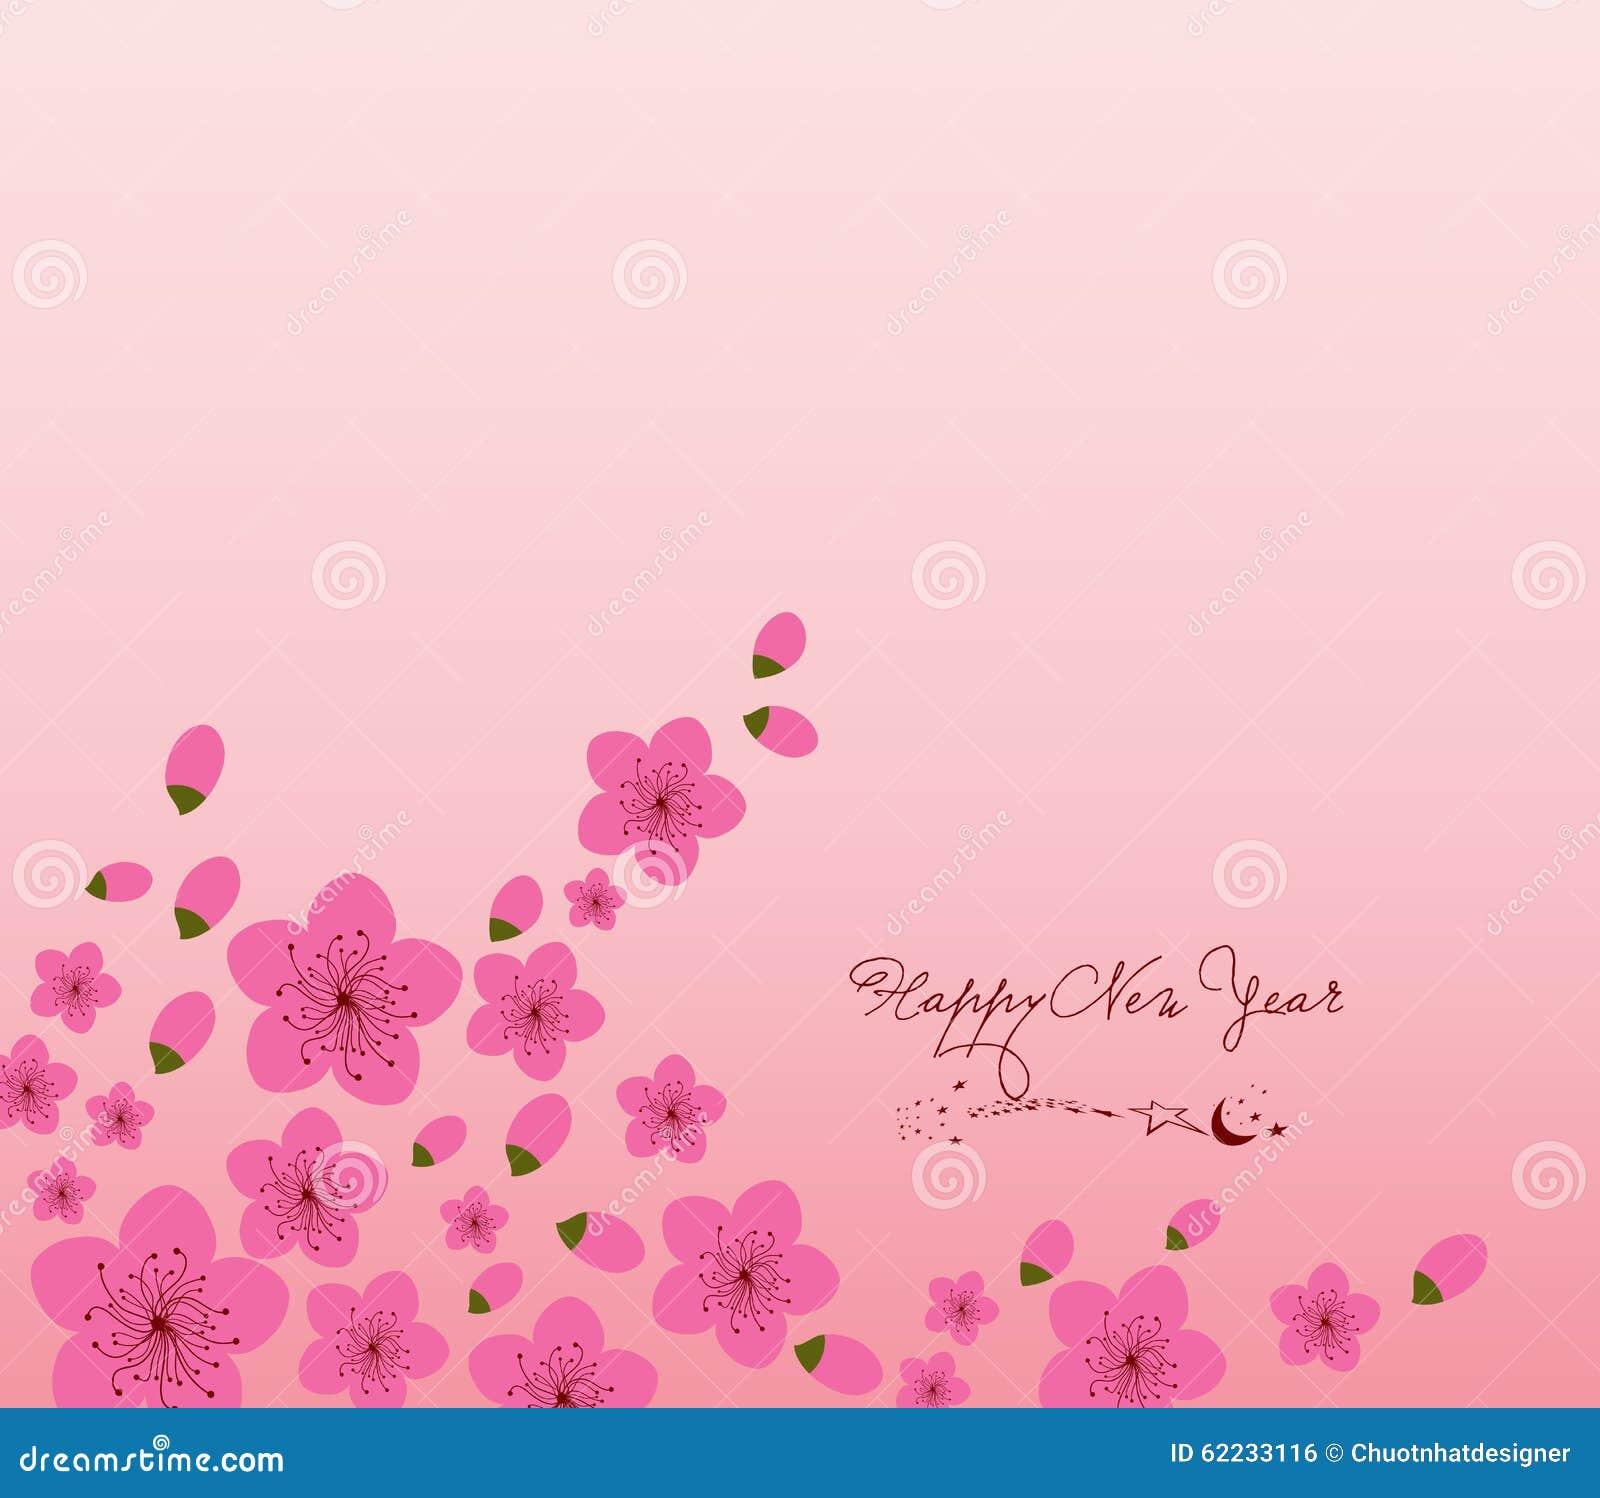 plum blossom wallpaper